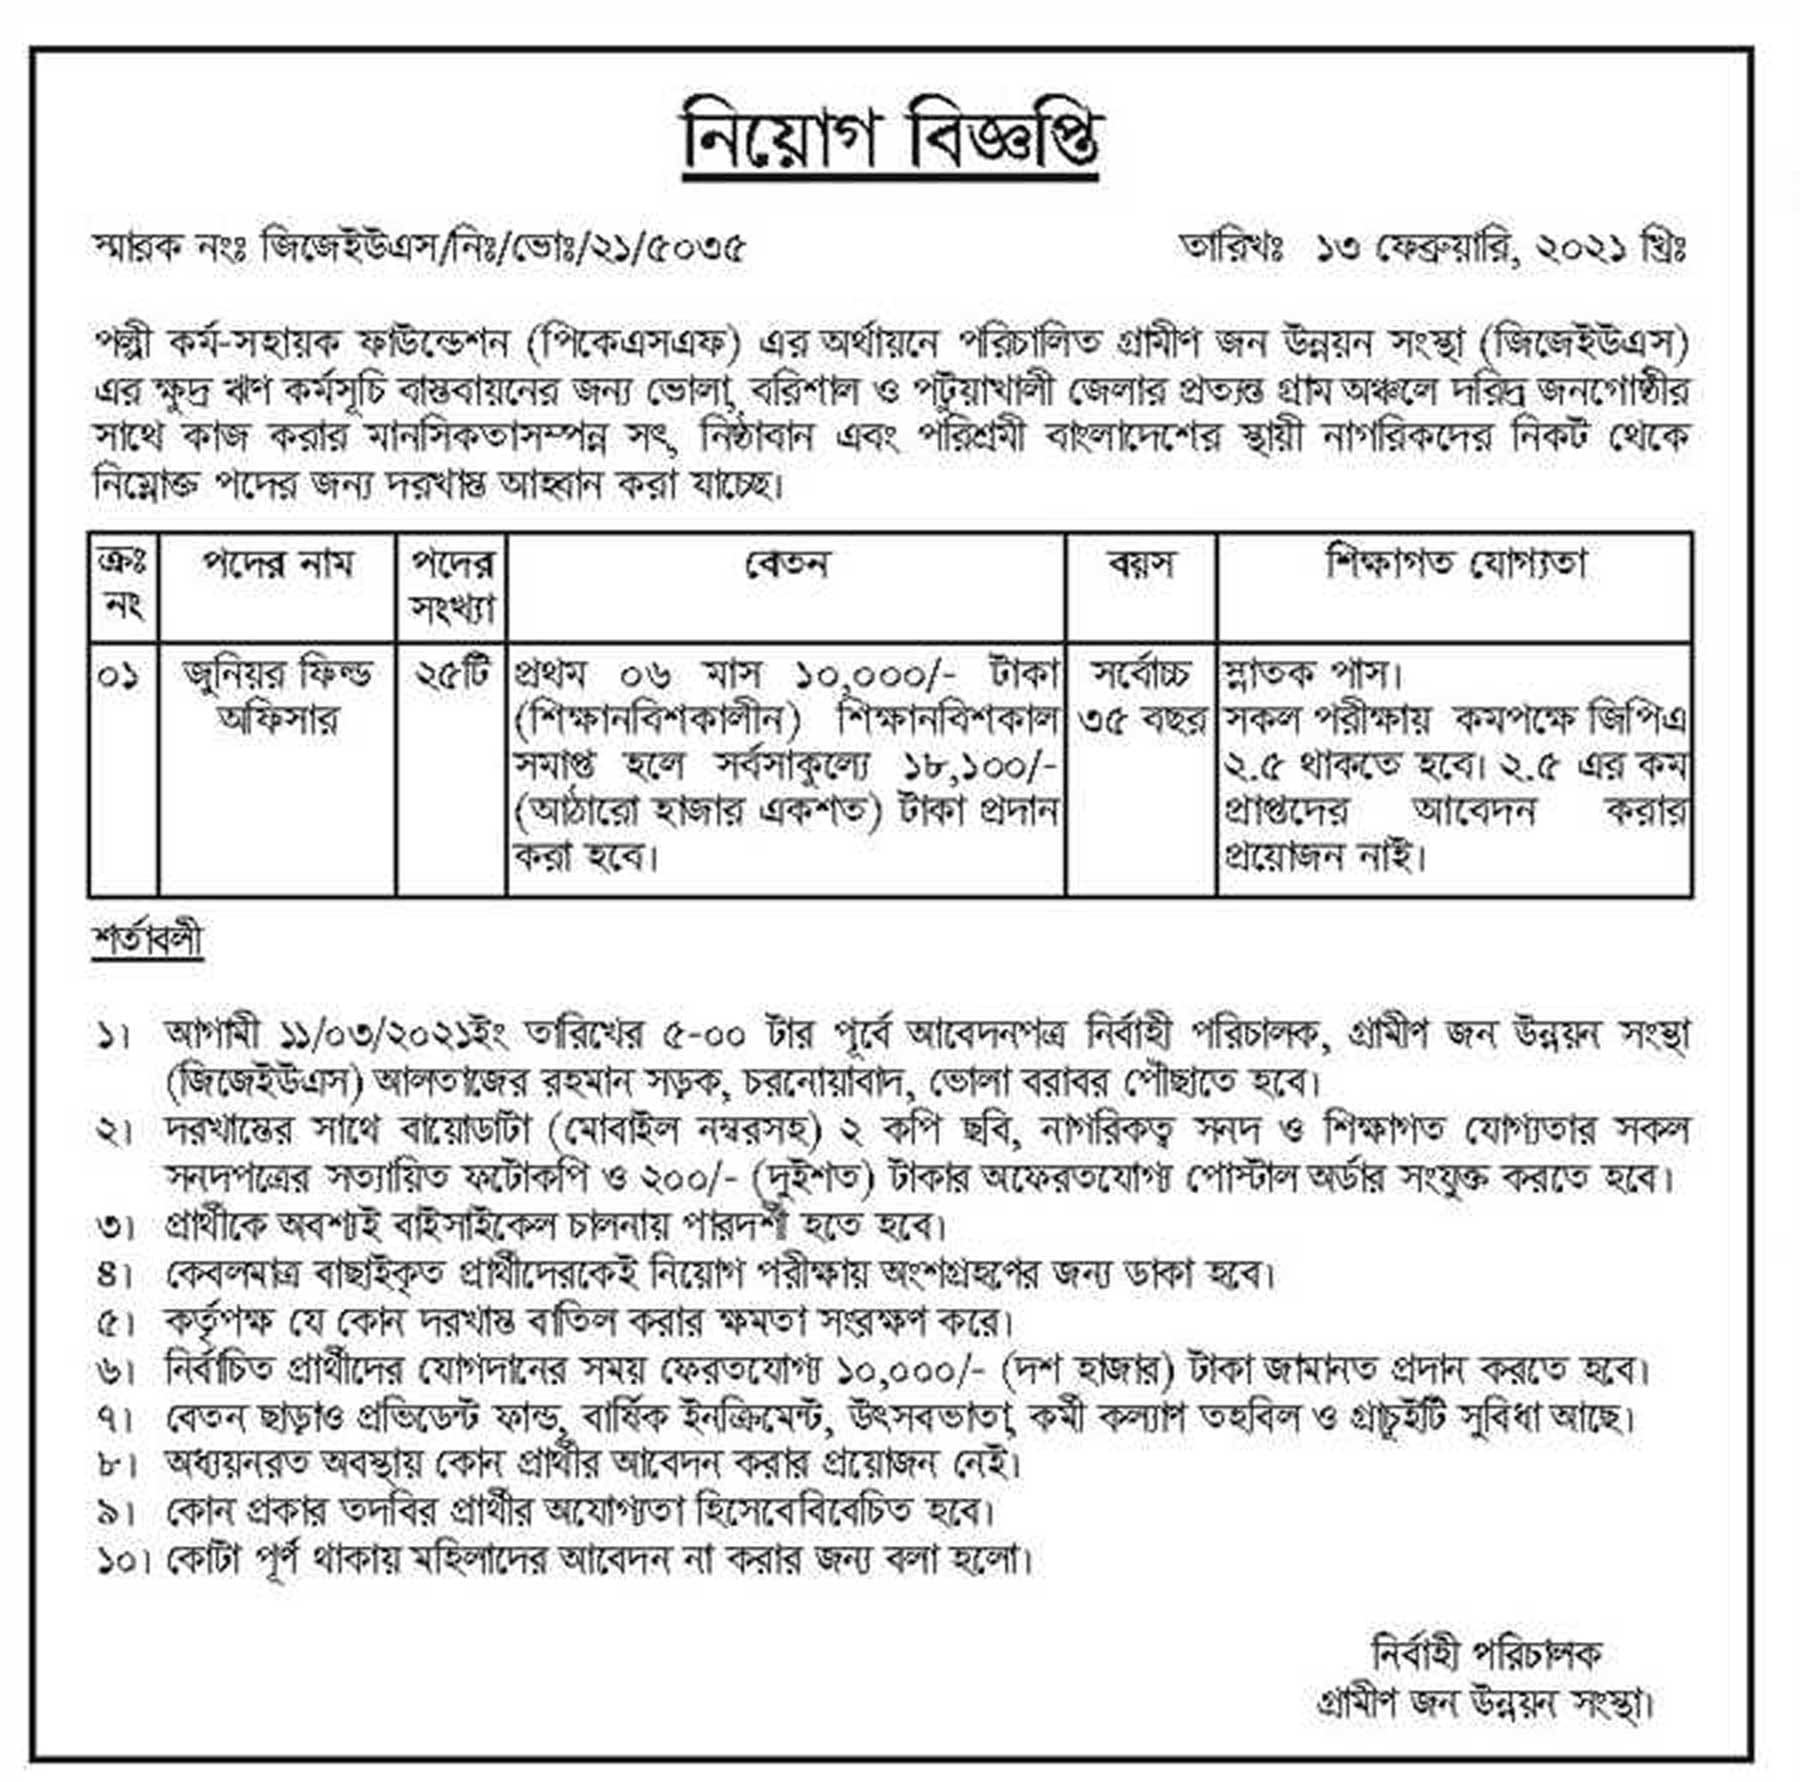 Palli Karma Sahayak Foundation PKSF Job Circular 2021